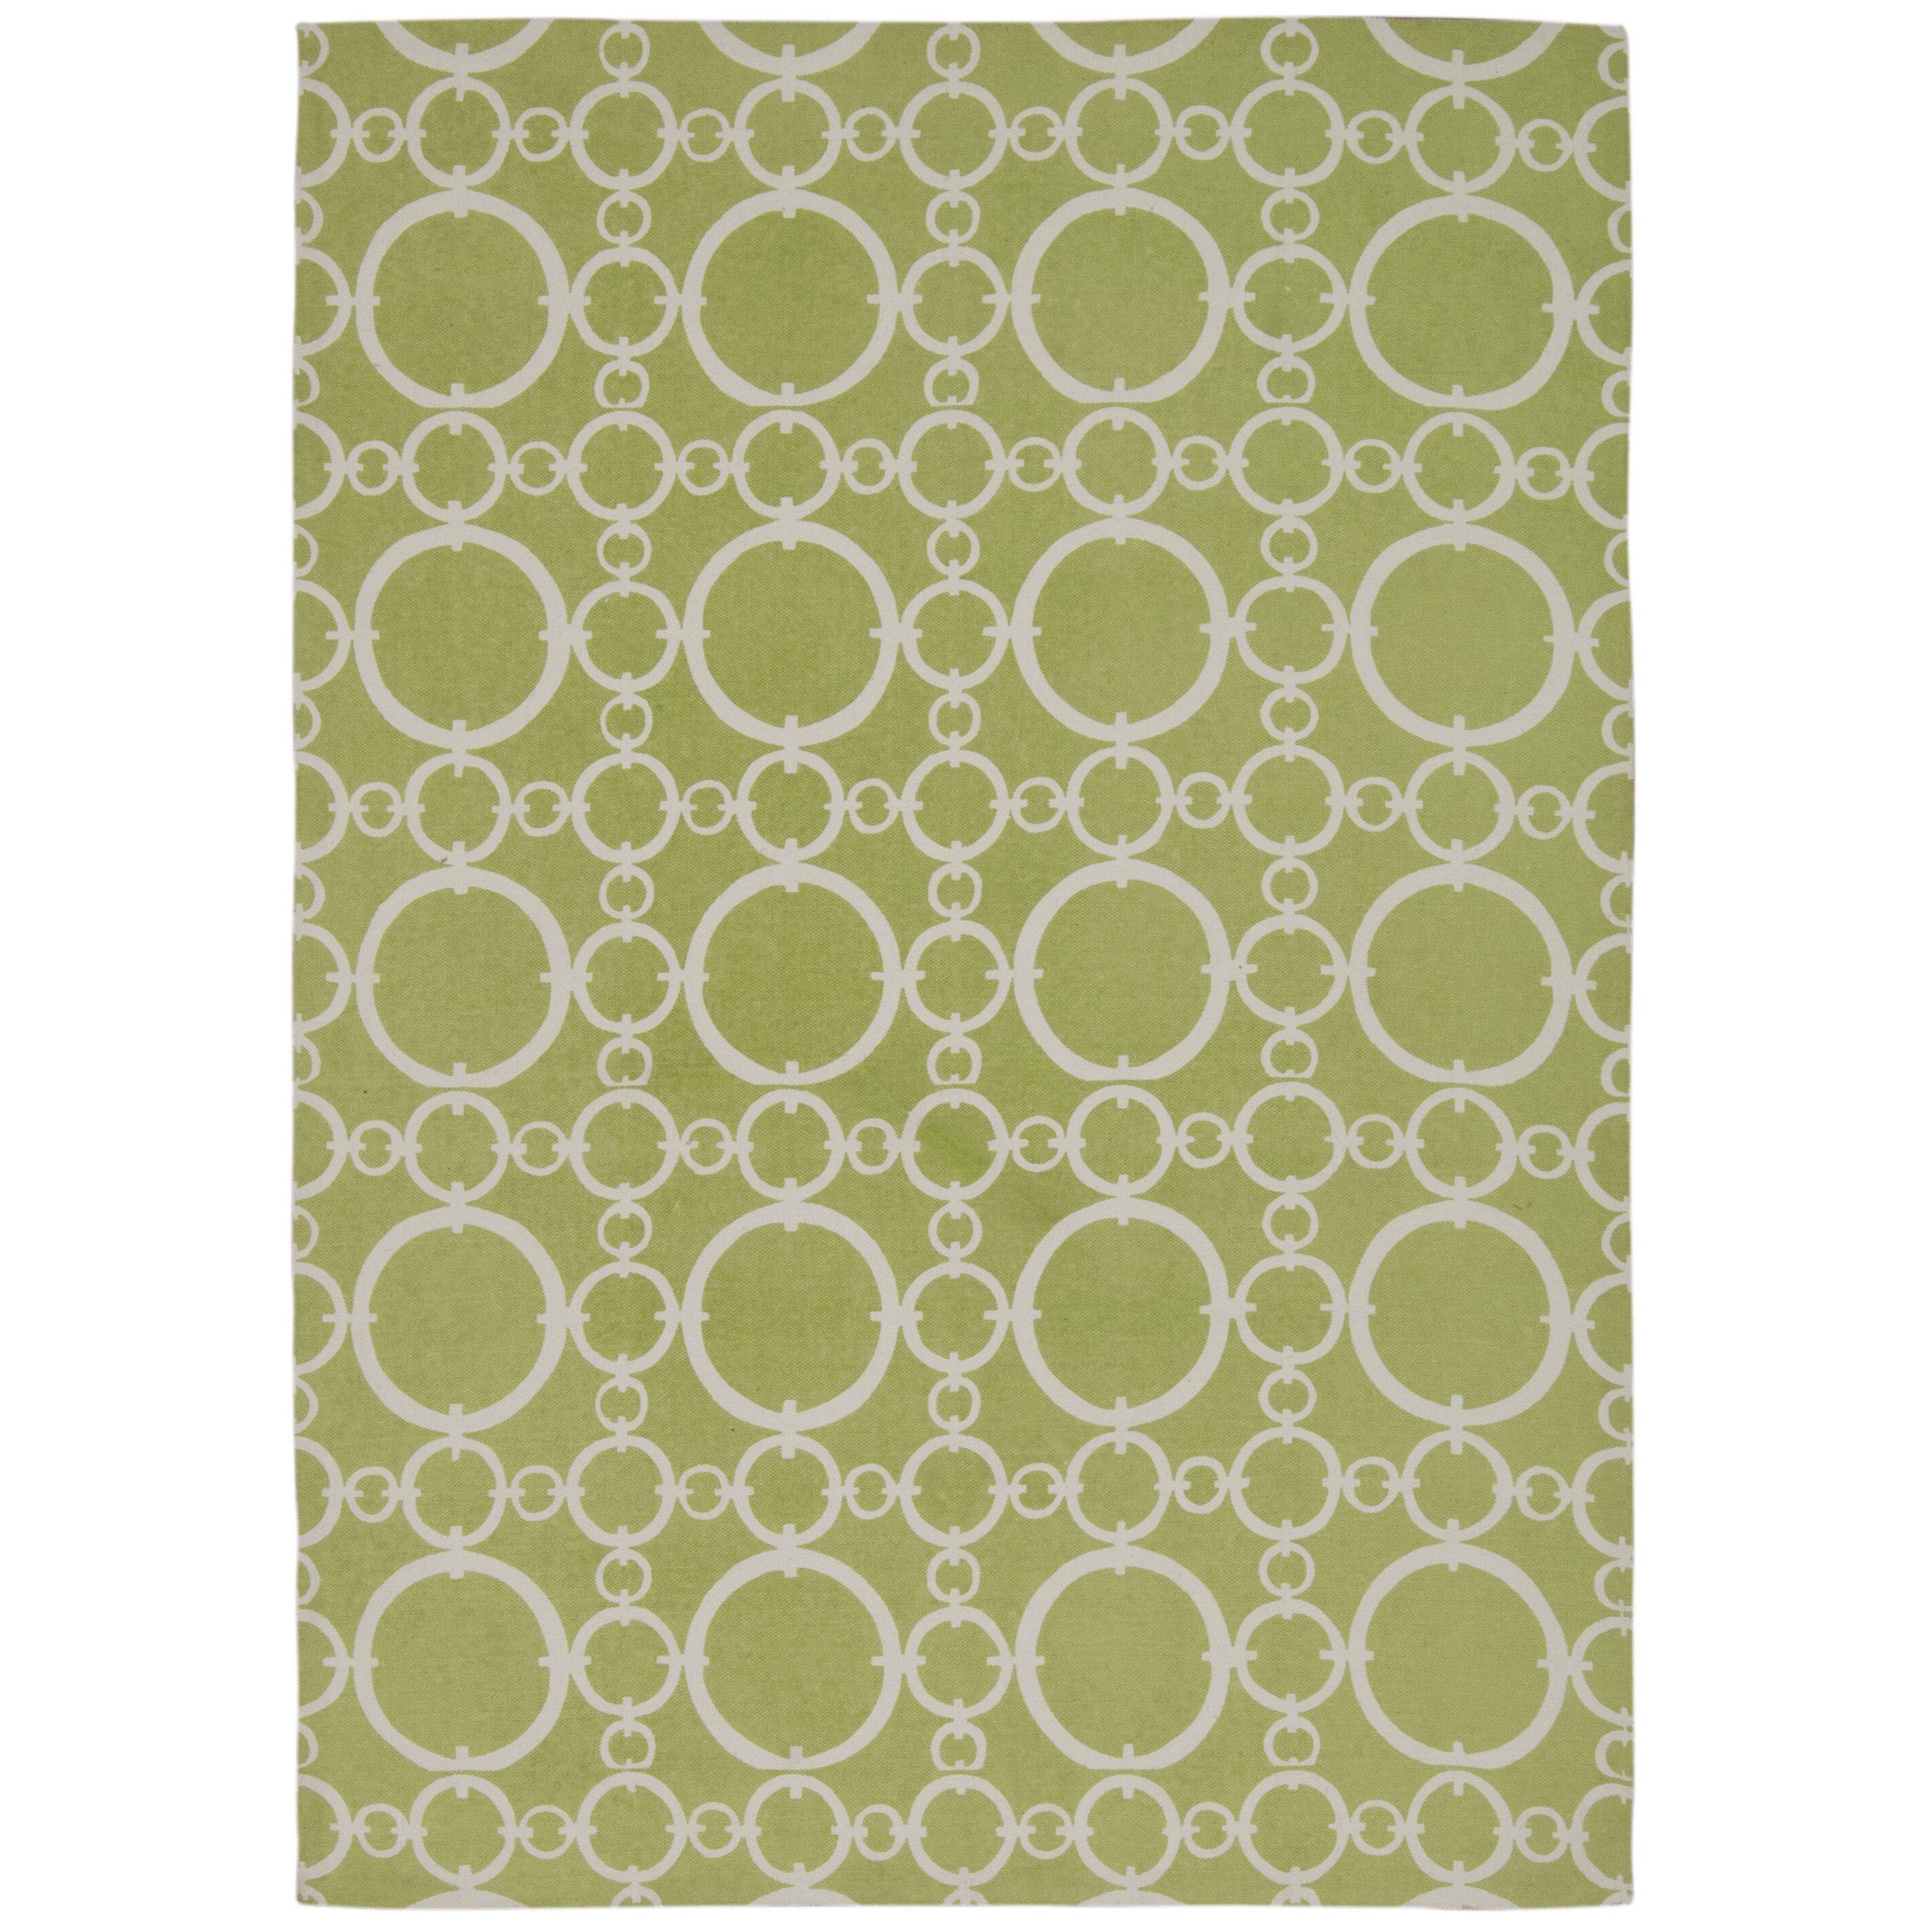 waverly rugs waverly rugs waverly sun and shade lovely lattice  - waverly rugs